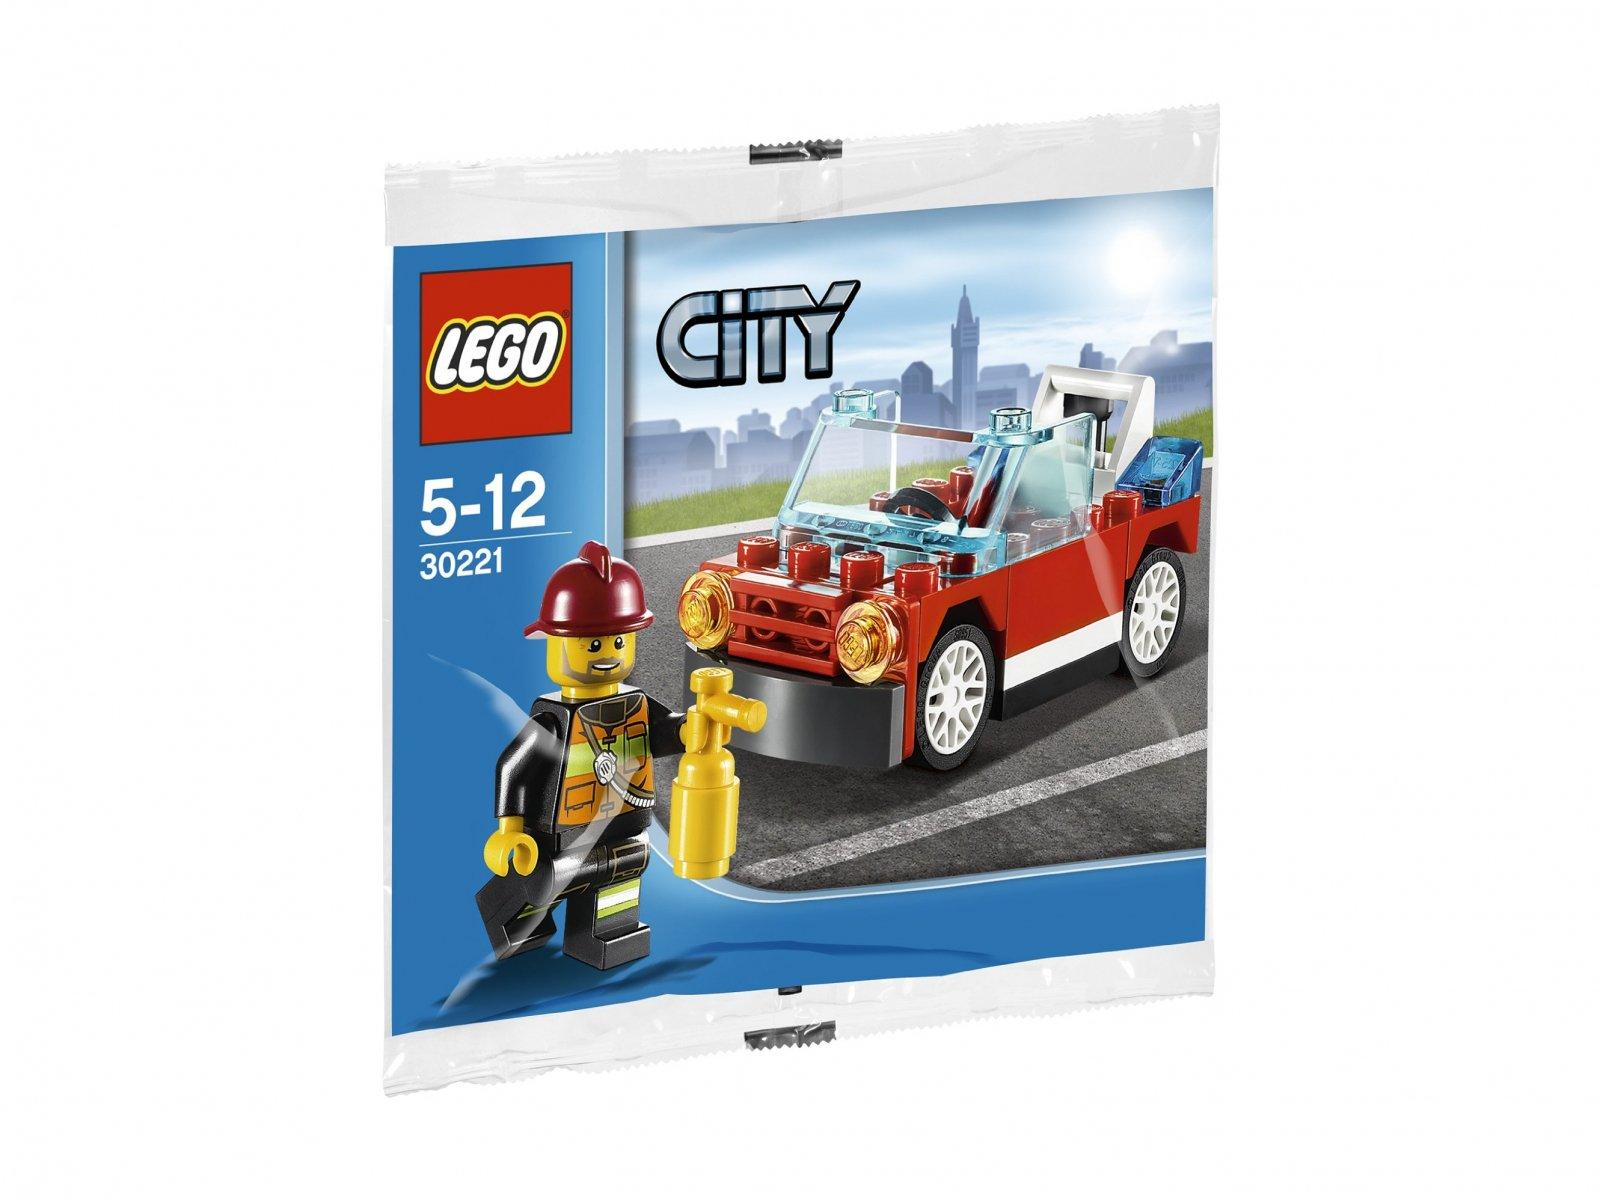 LEGO City Fire Car 30221